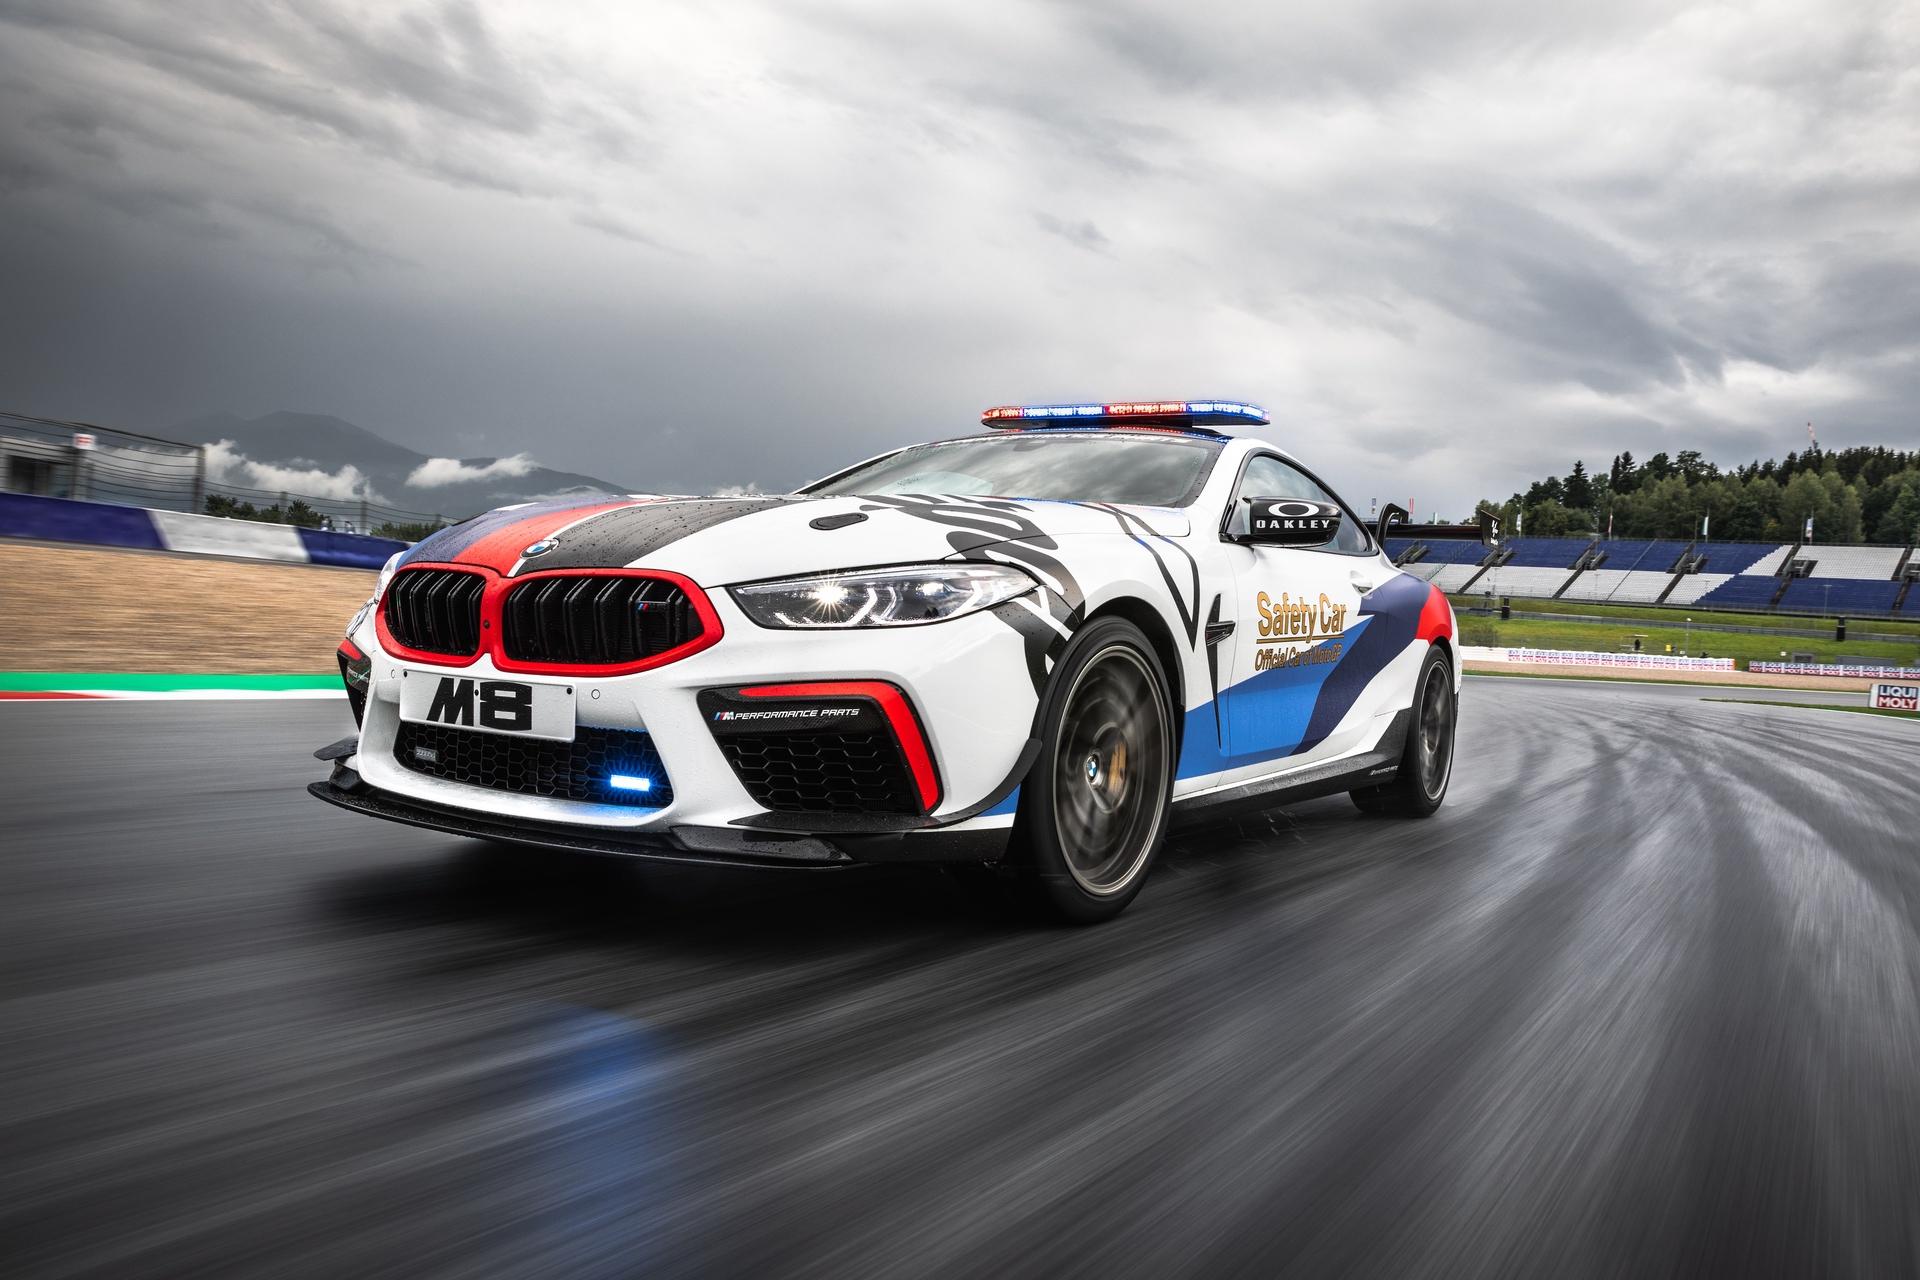 BMW_M8_MotoGP_Safety_Car_0011